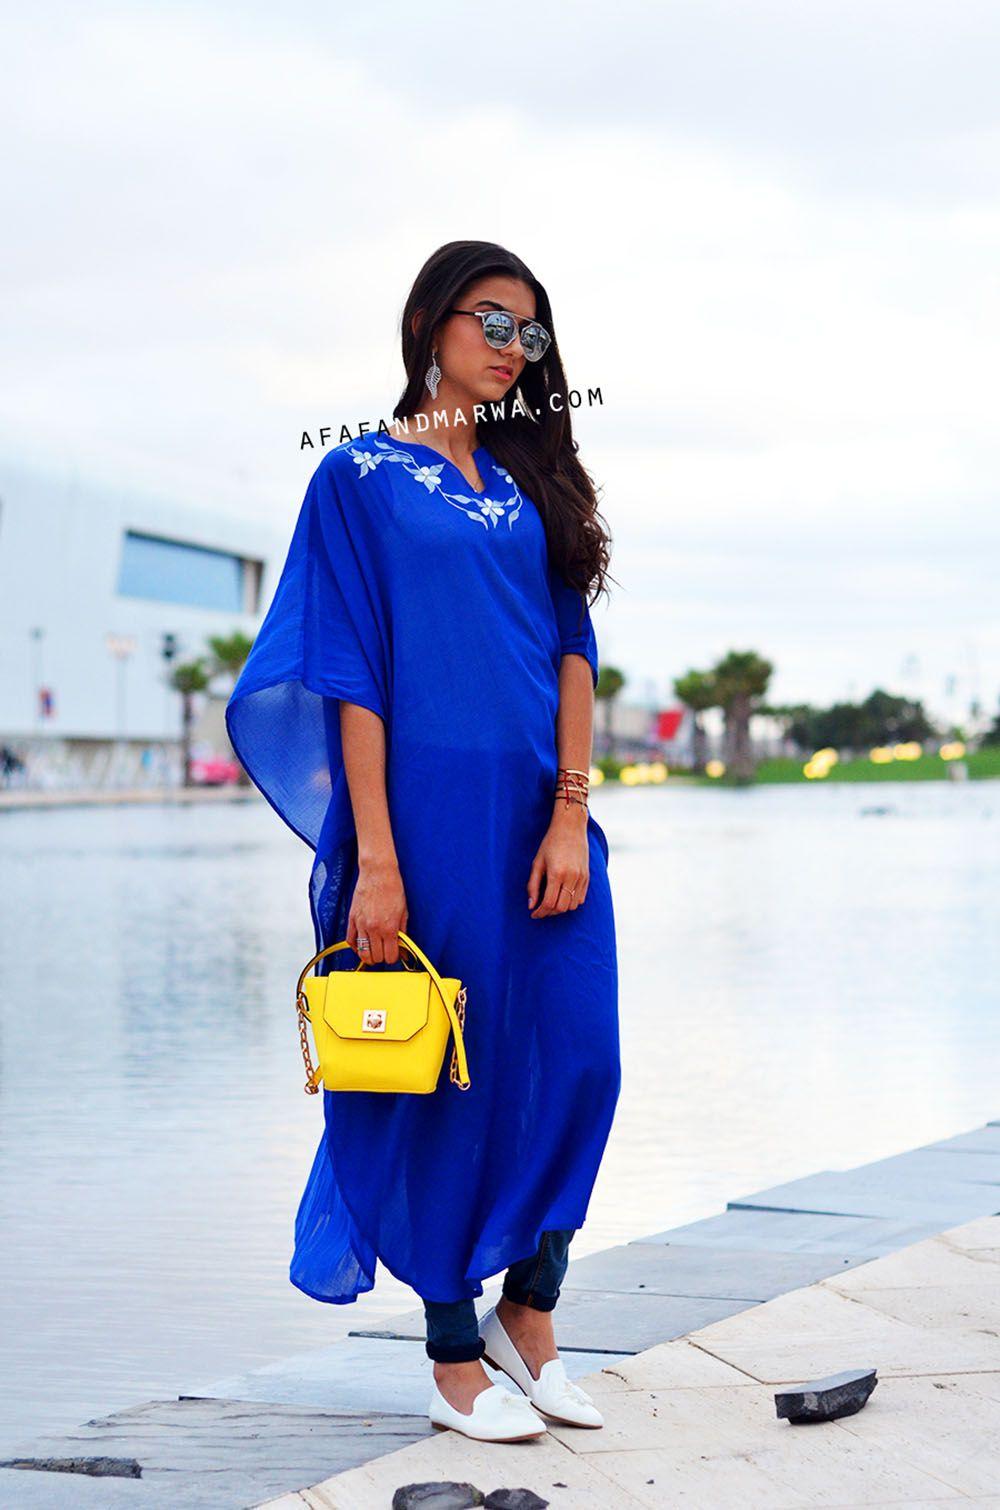 gandoura bleue, moroccan kaftan, tenue ramadan, ramadan outfit, moroccan  gandorua, afaf